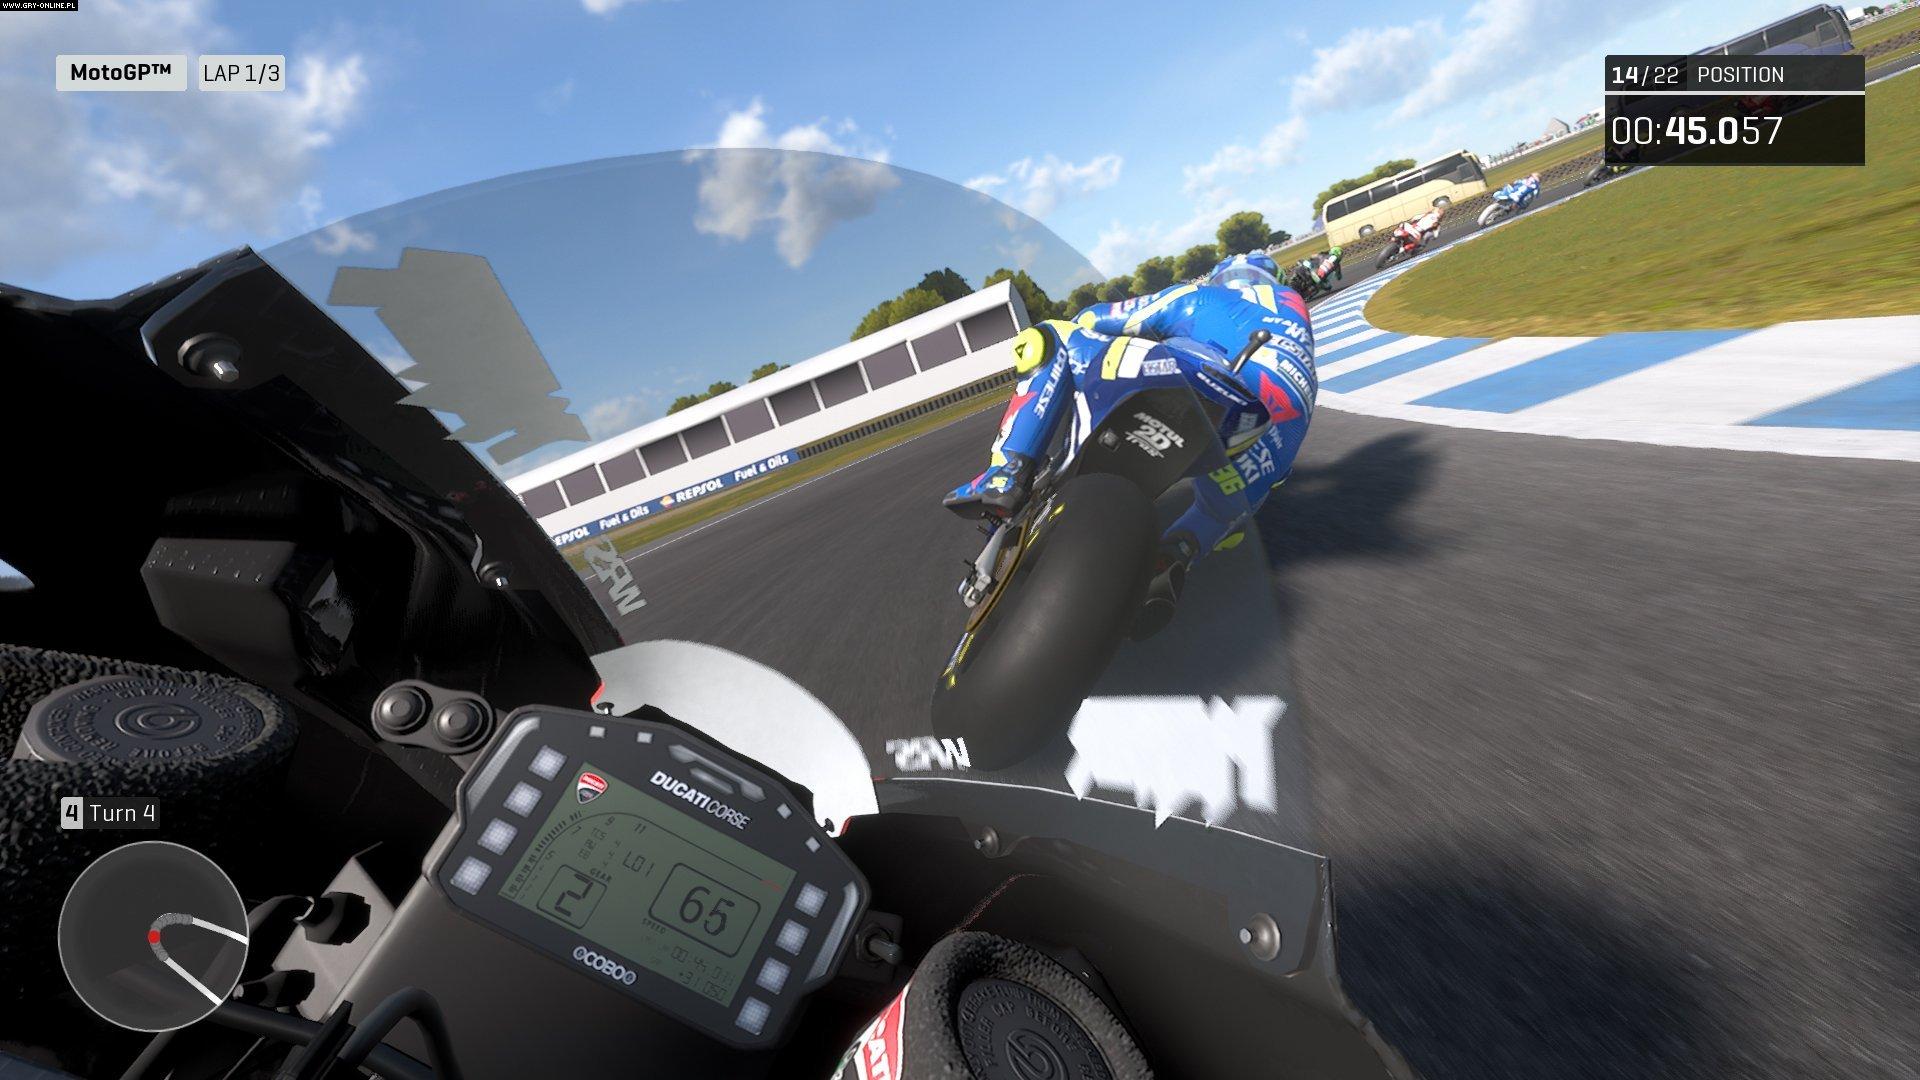 MotoGP 19 PC, PS4, XONE, Switch Games Image 1/15, Milestone